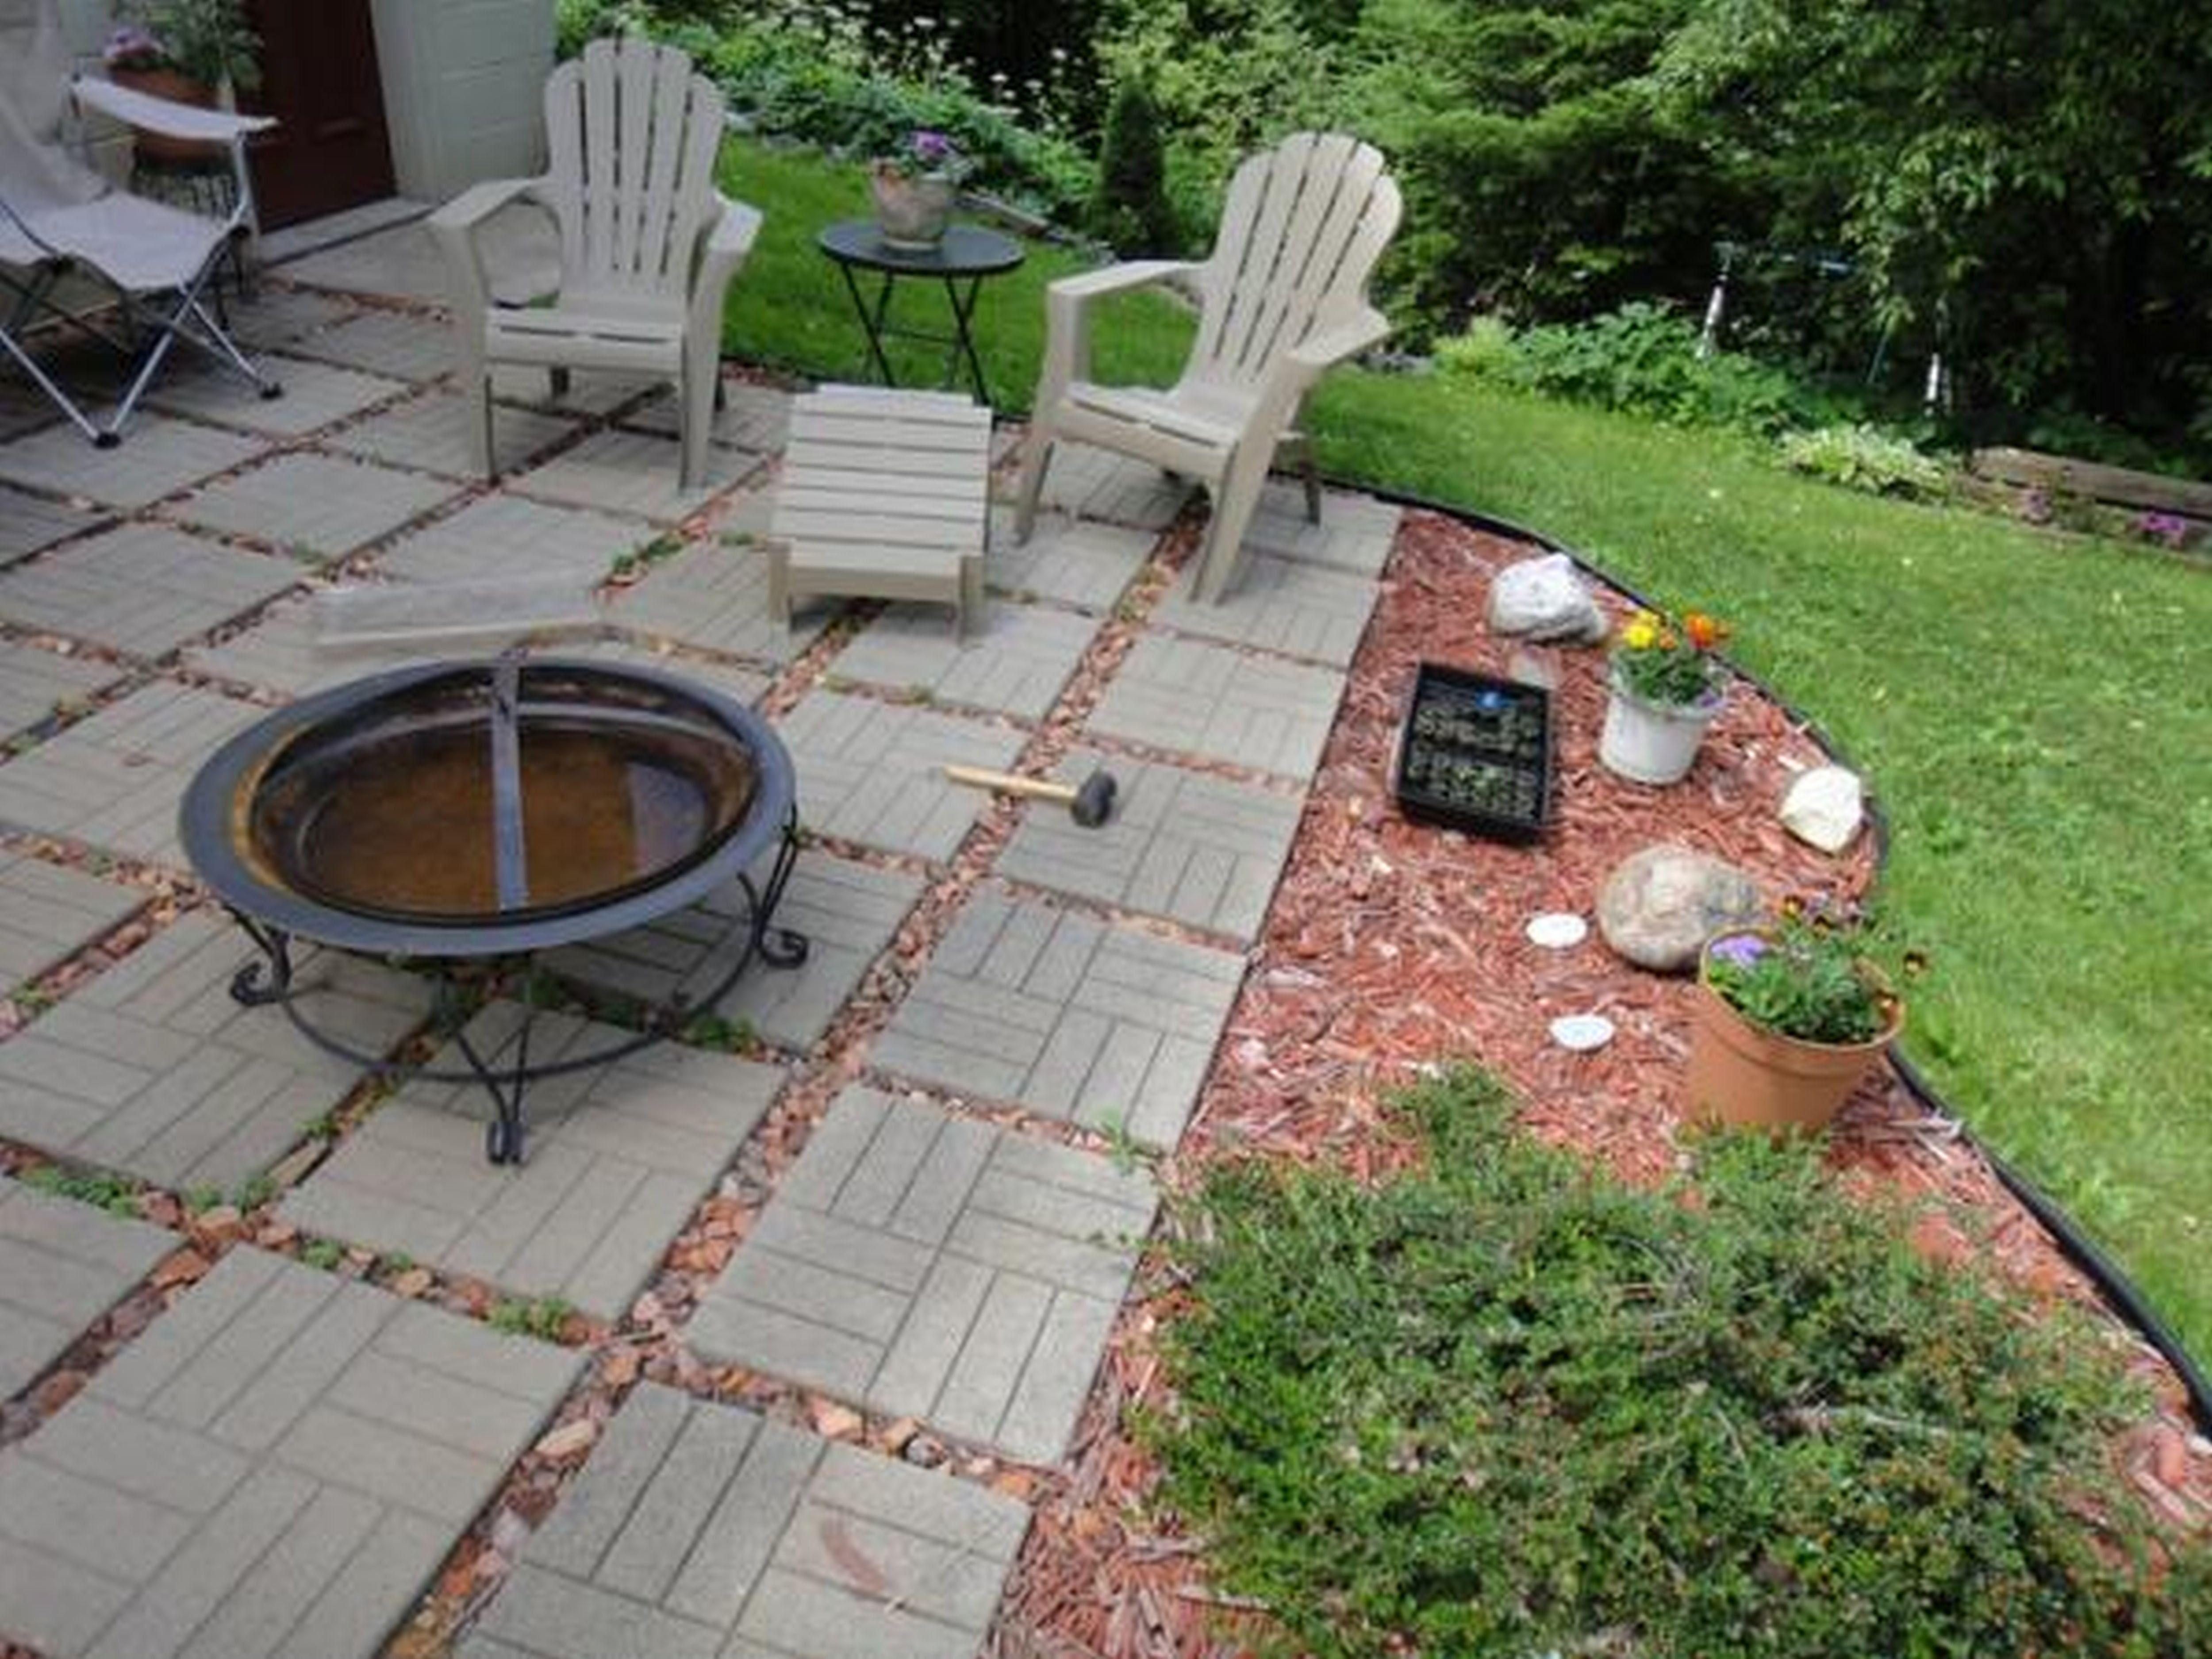 Inexpensive Patio Floor Ideas Small Backyard Landscaping Diy Backyard Landscaping Patio Landscaping